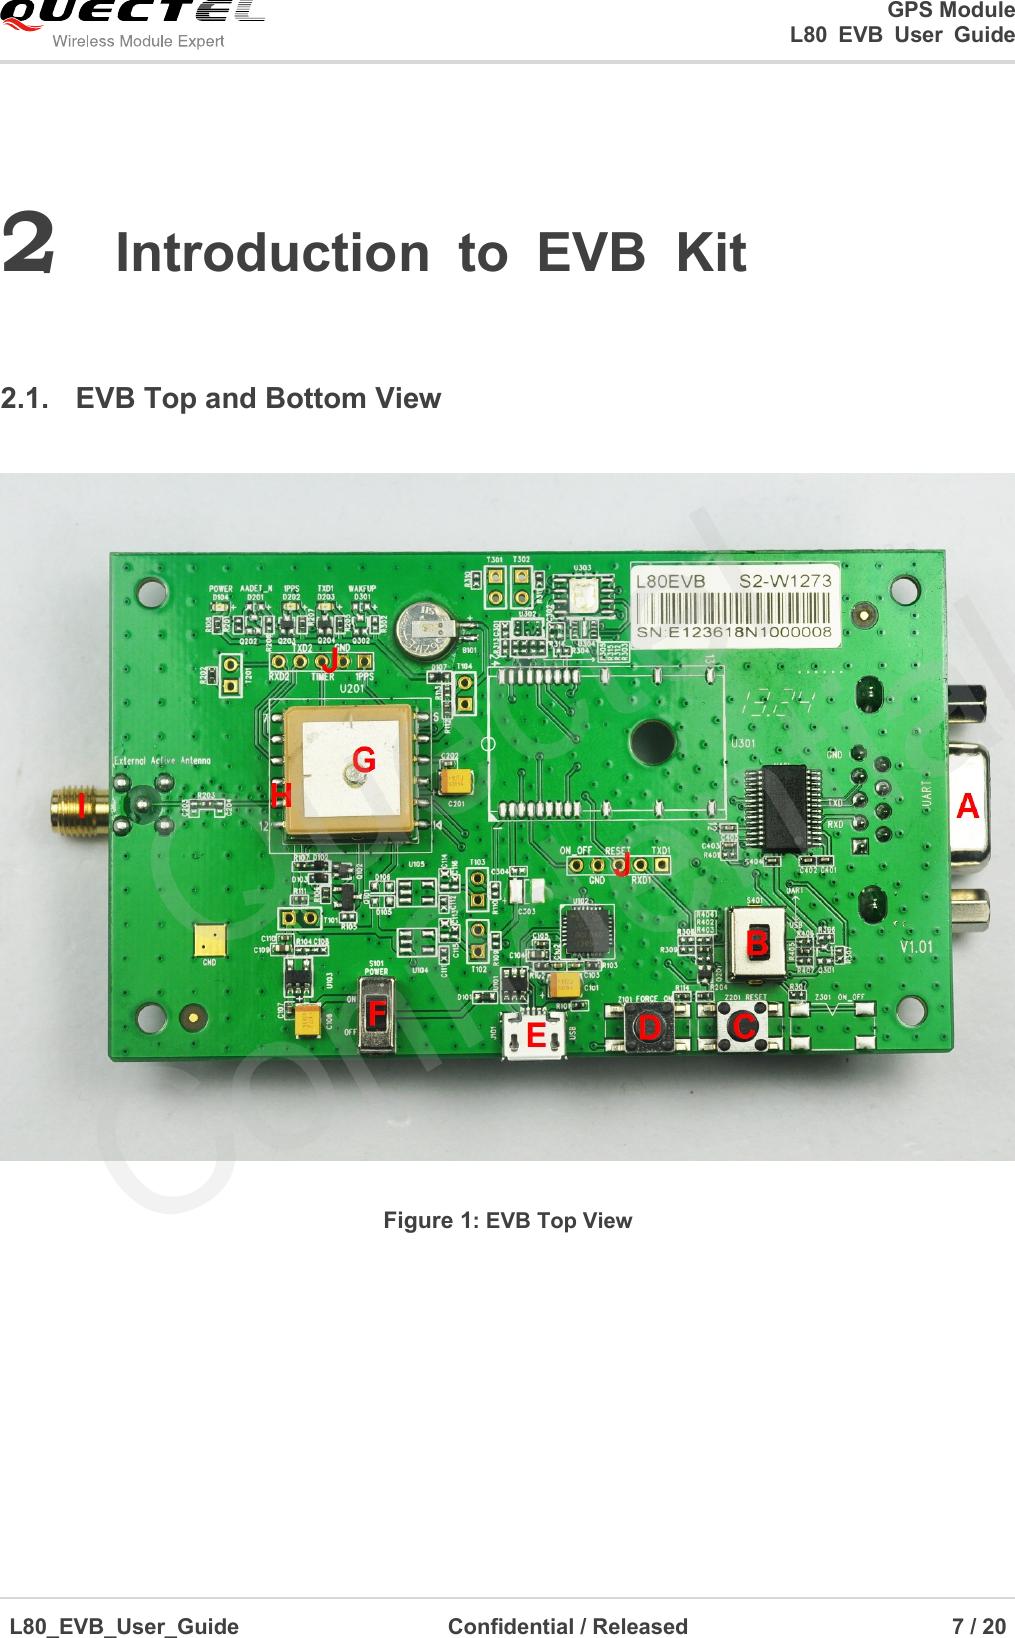 Quectel L80 EVB User Guide V1 0